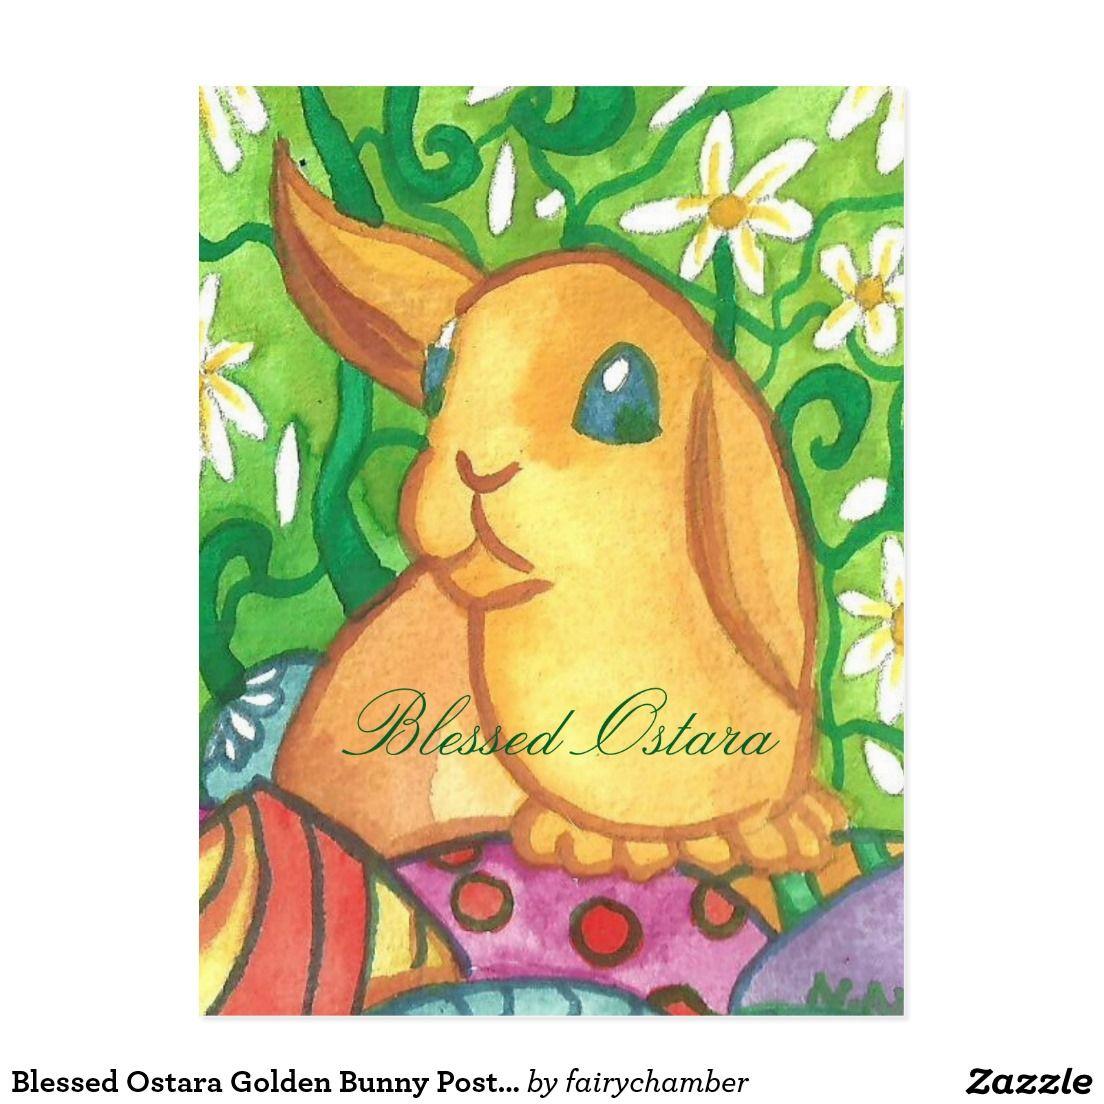 Blessed Ostara Golden Bunny Postcard | Art by Fairychamber | Pinterest